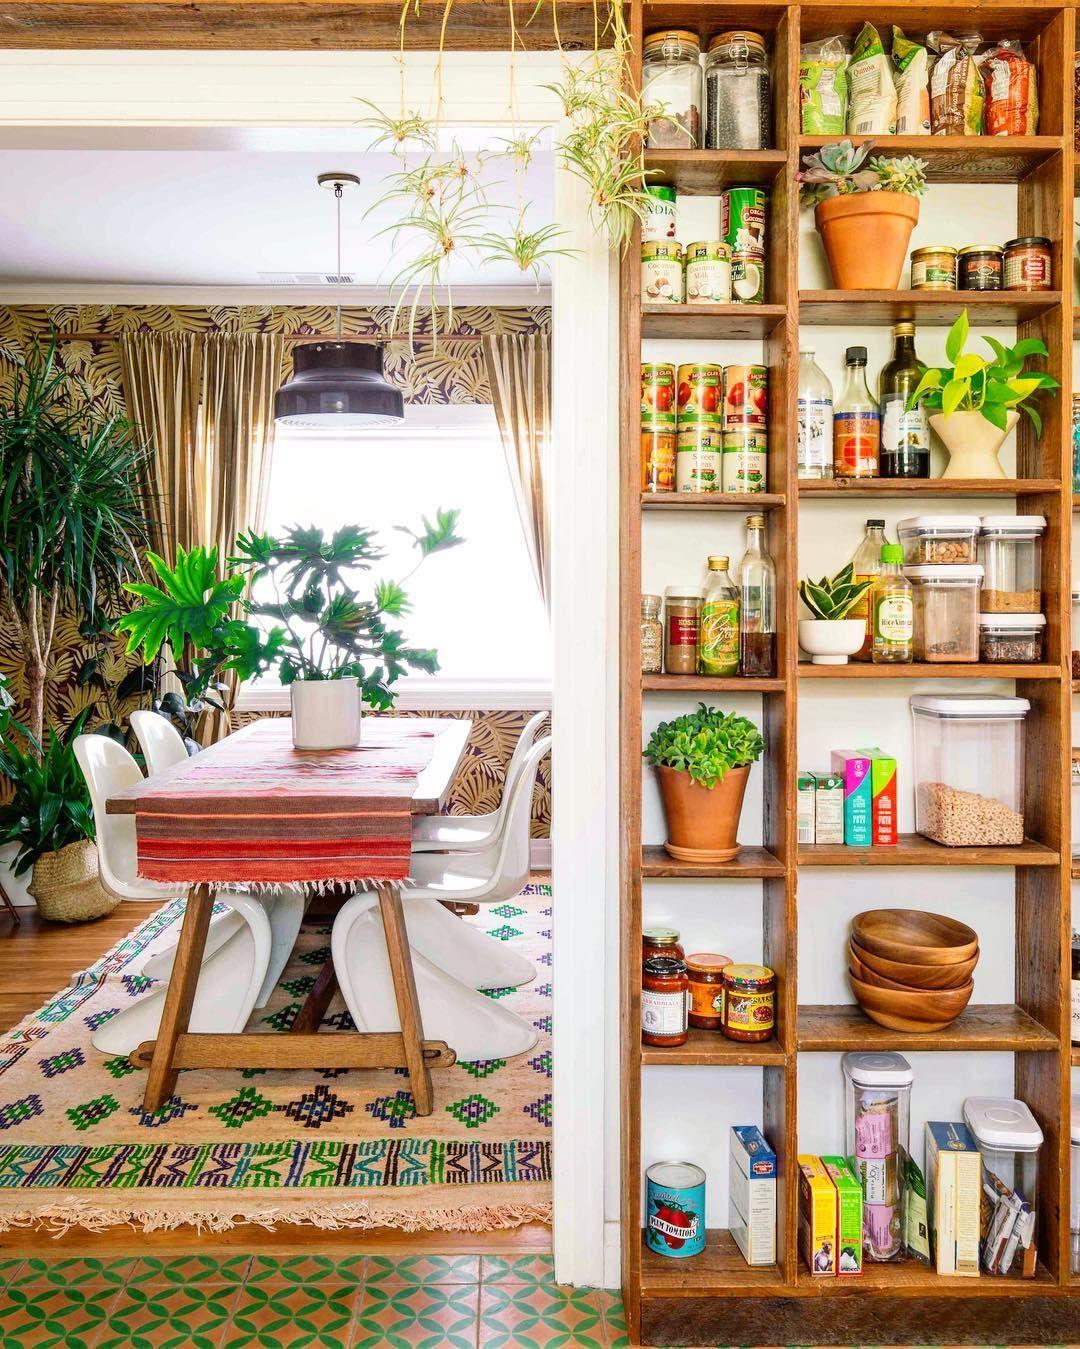 dining boho style justinablakeney home boho gypsy hippie decor pinterest boho style on boho chic decor living room bohemian kitchen id=12879